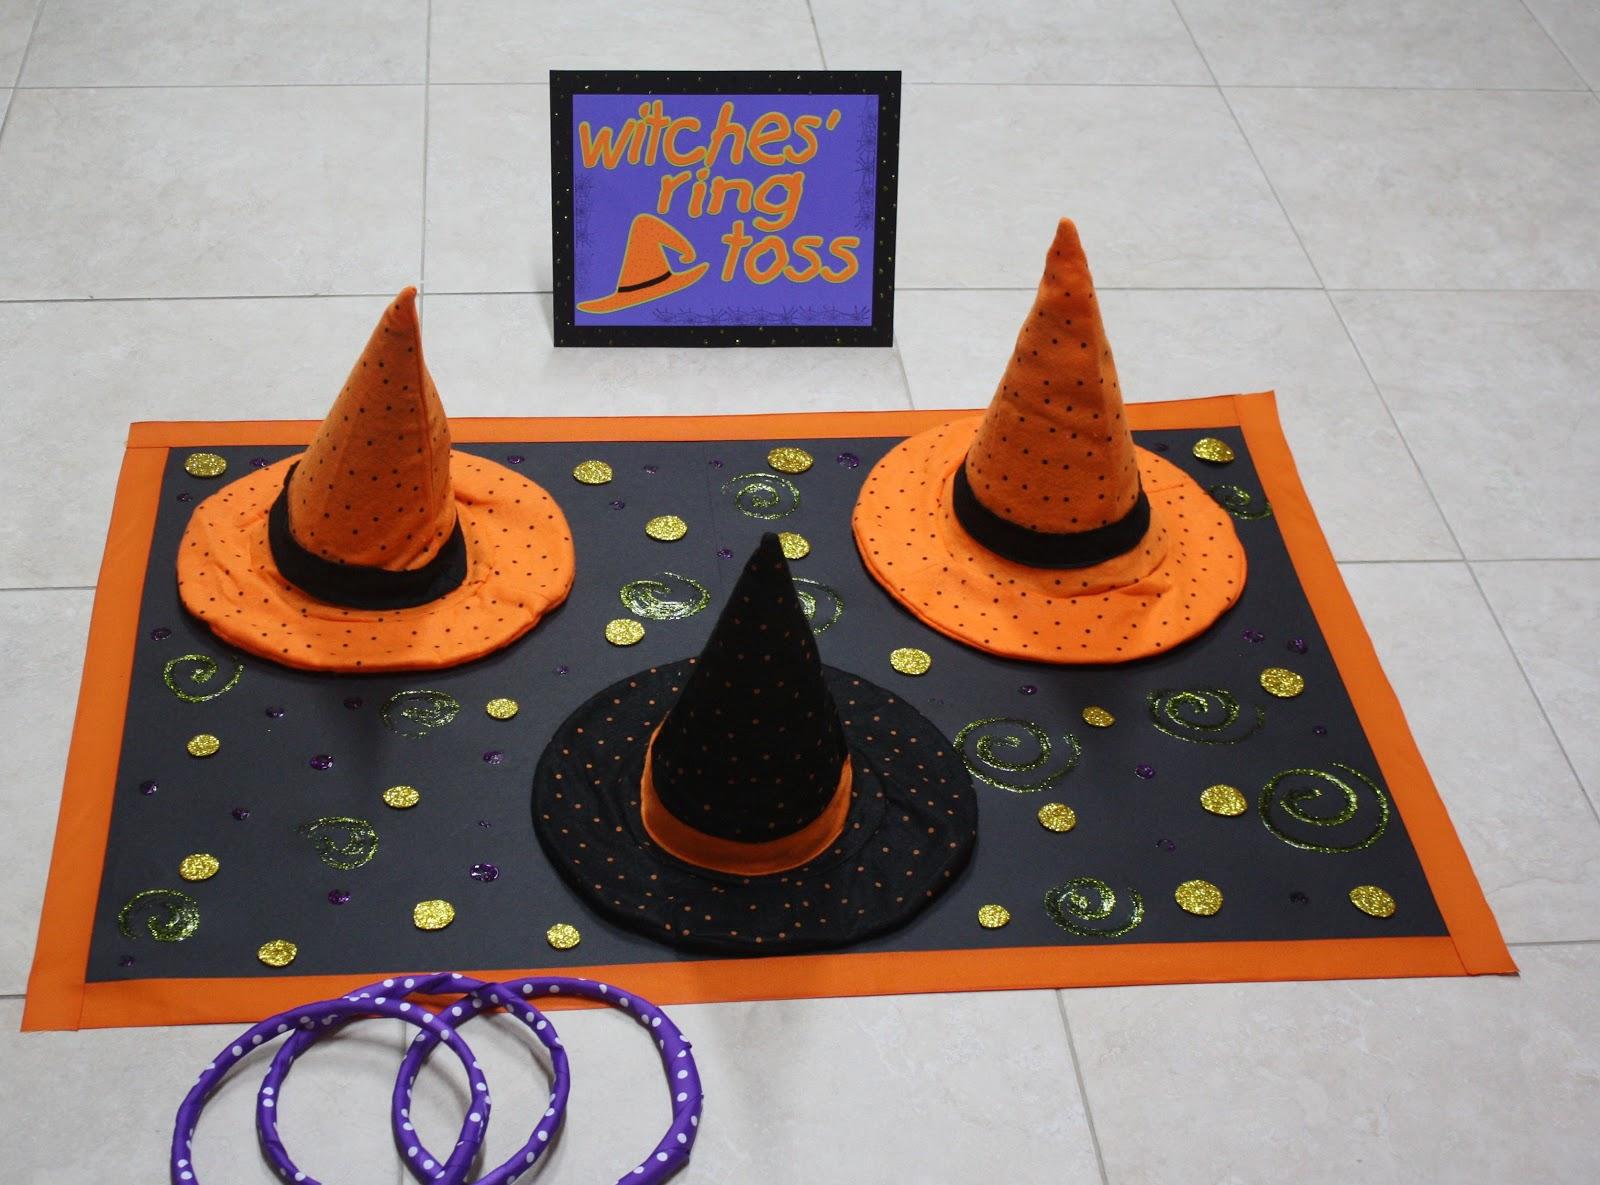 como hacer decoracin para fiesta de halloween parte 44 como fazerdecorao para festa de halloween 44